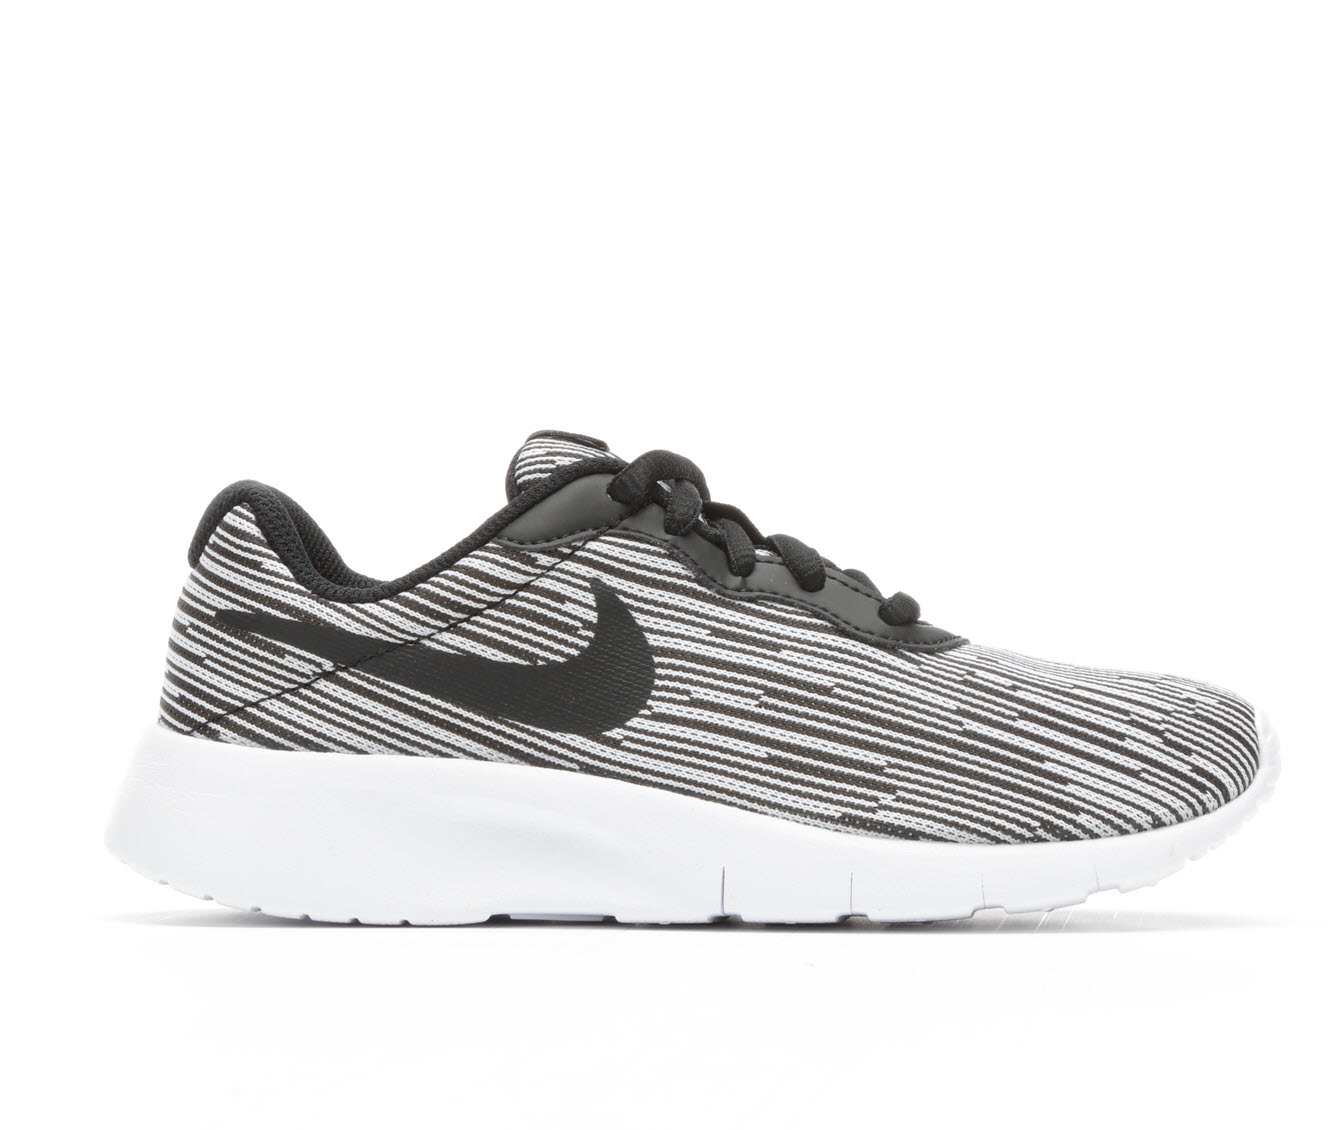 Boys' Nike Tanjun Special Edition Sneakers (Black - Size 12 - Little Kid) 1657144